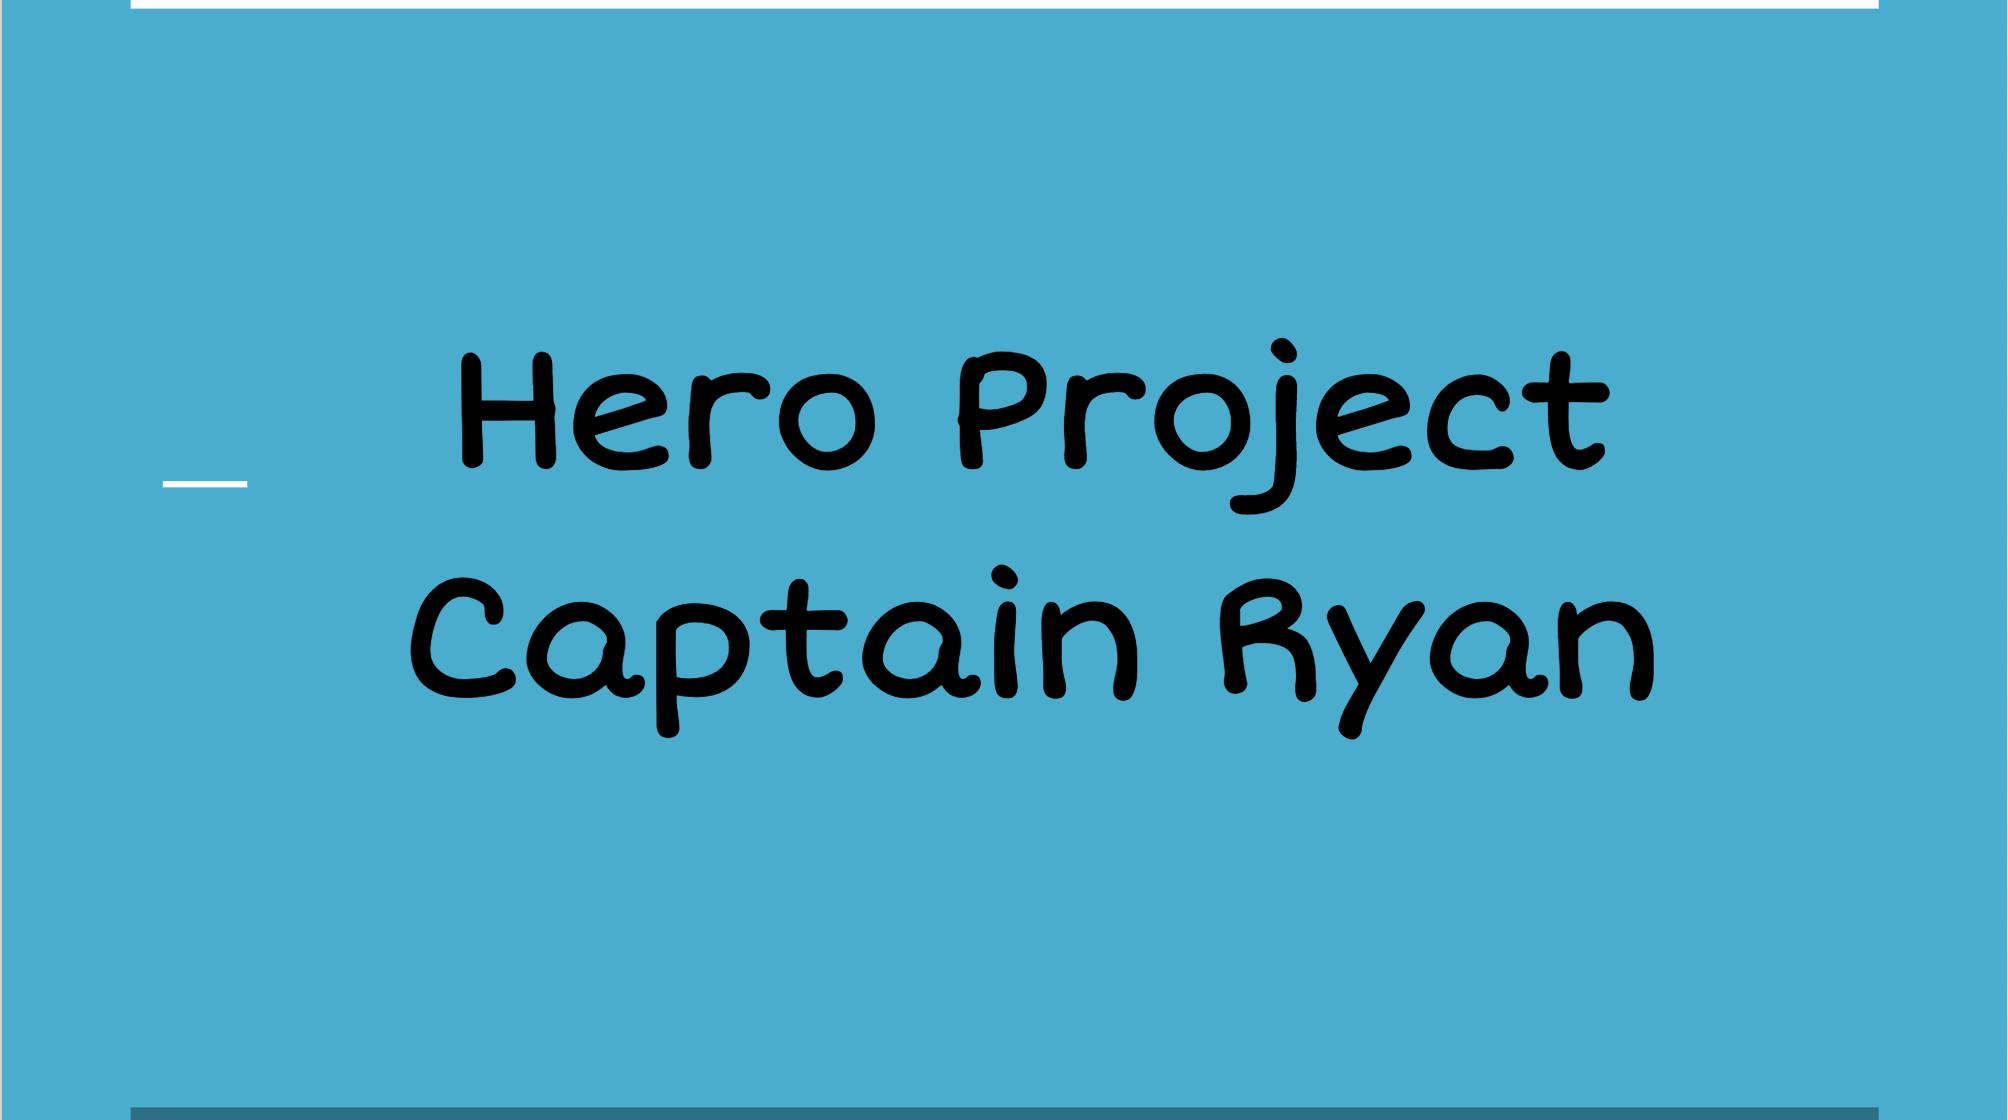 Clare Kisner Hero Project North face logo, Hero